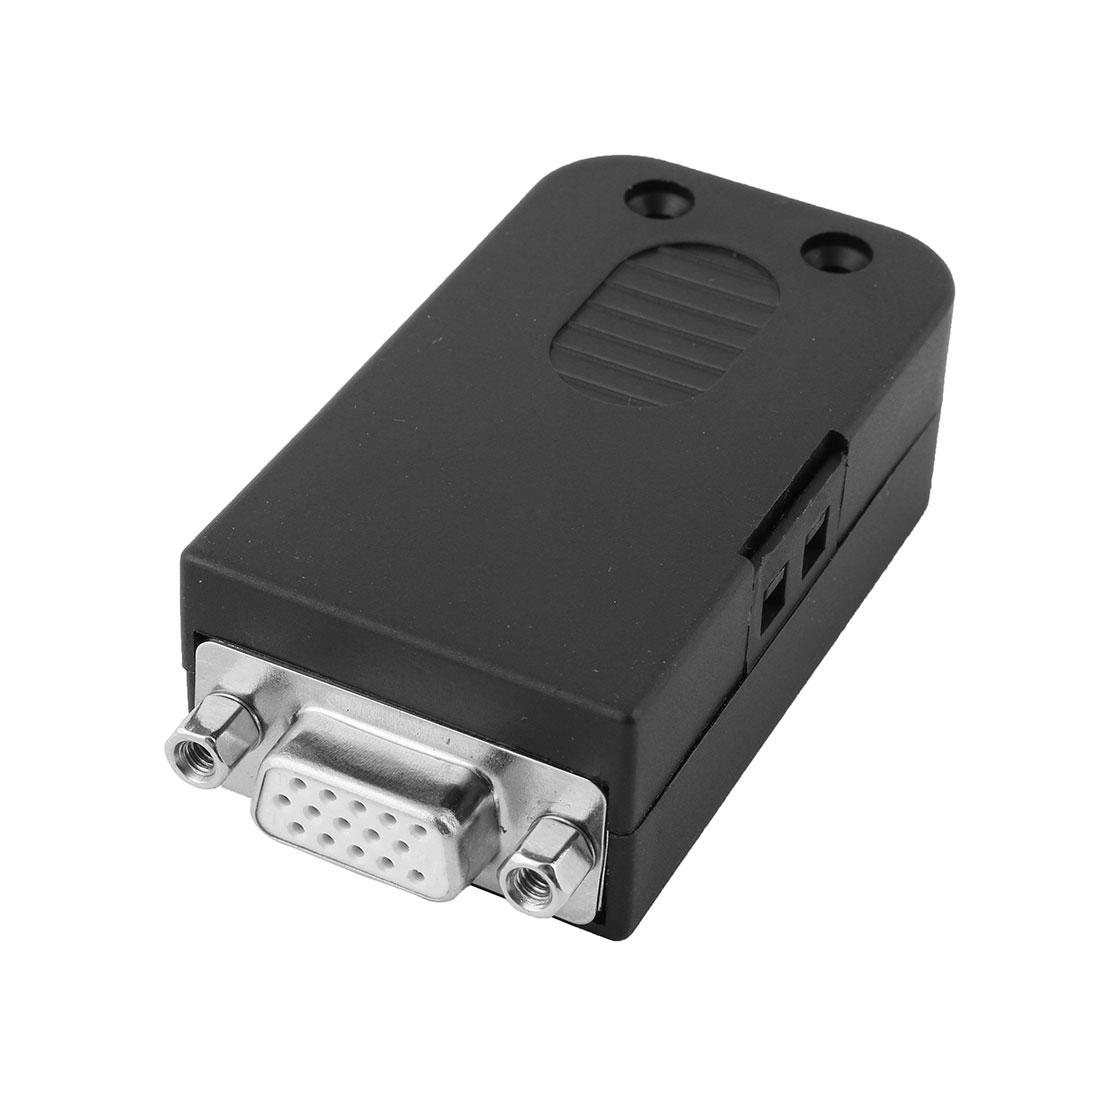 DIY D-SUB DB15 VGA Female Plastic Shell Breakout Terminals Board Connector w Screw